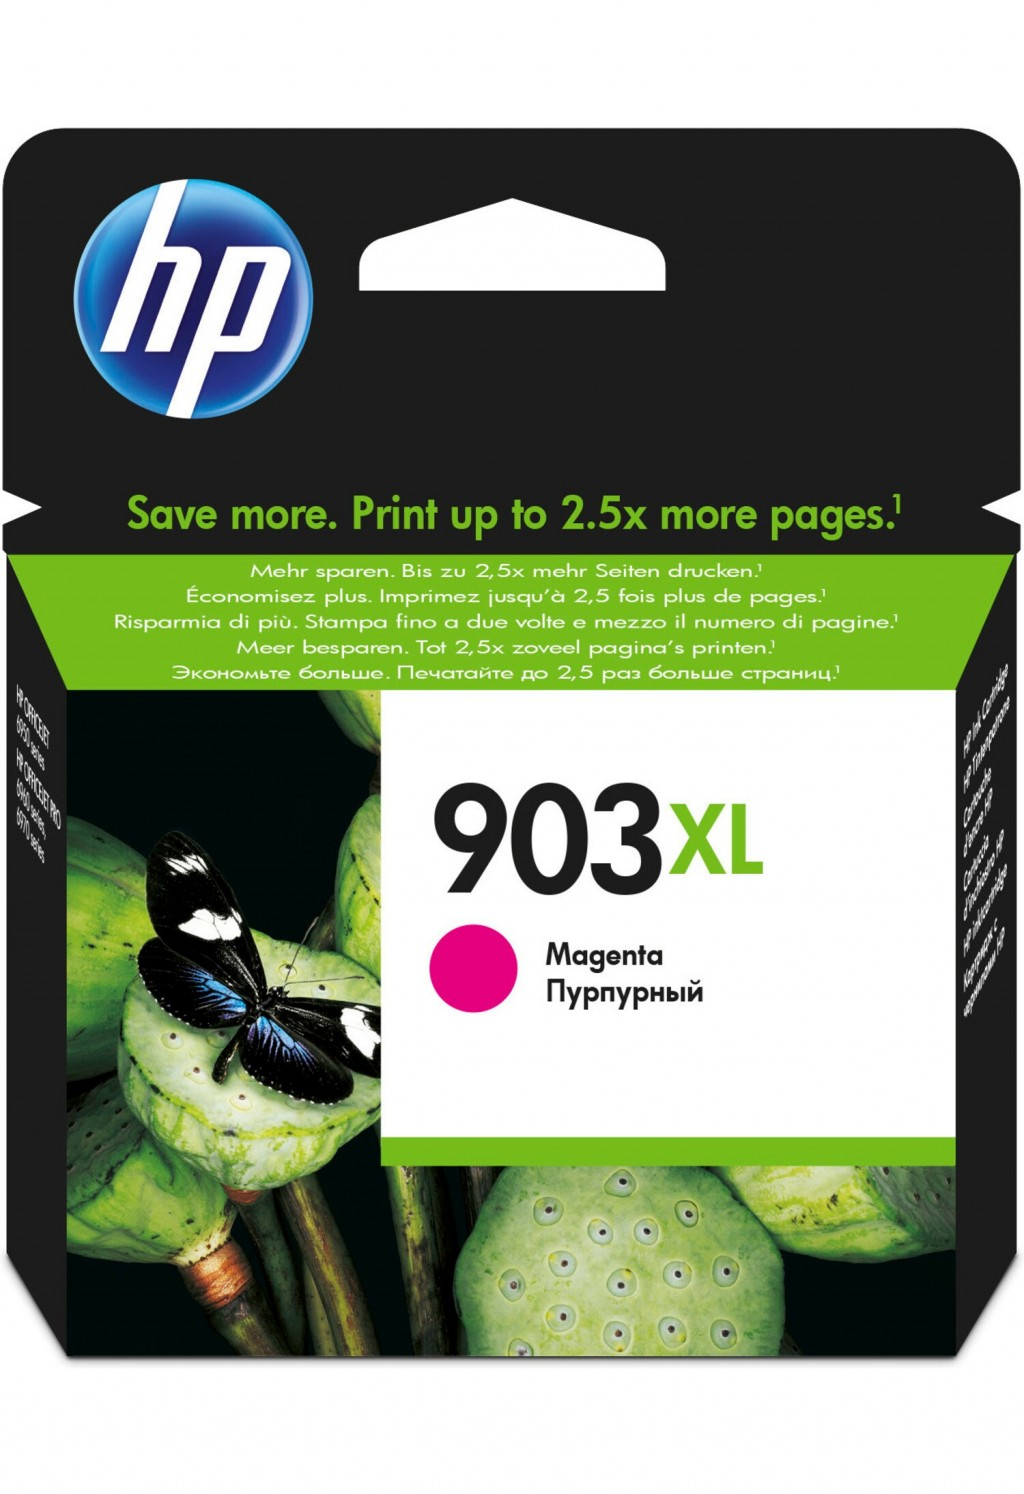 HP 903XL ink cartridge, magenta, high capacity